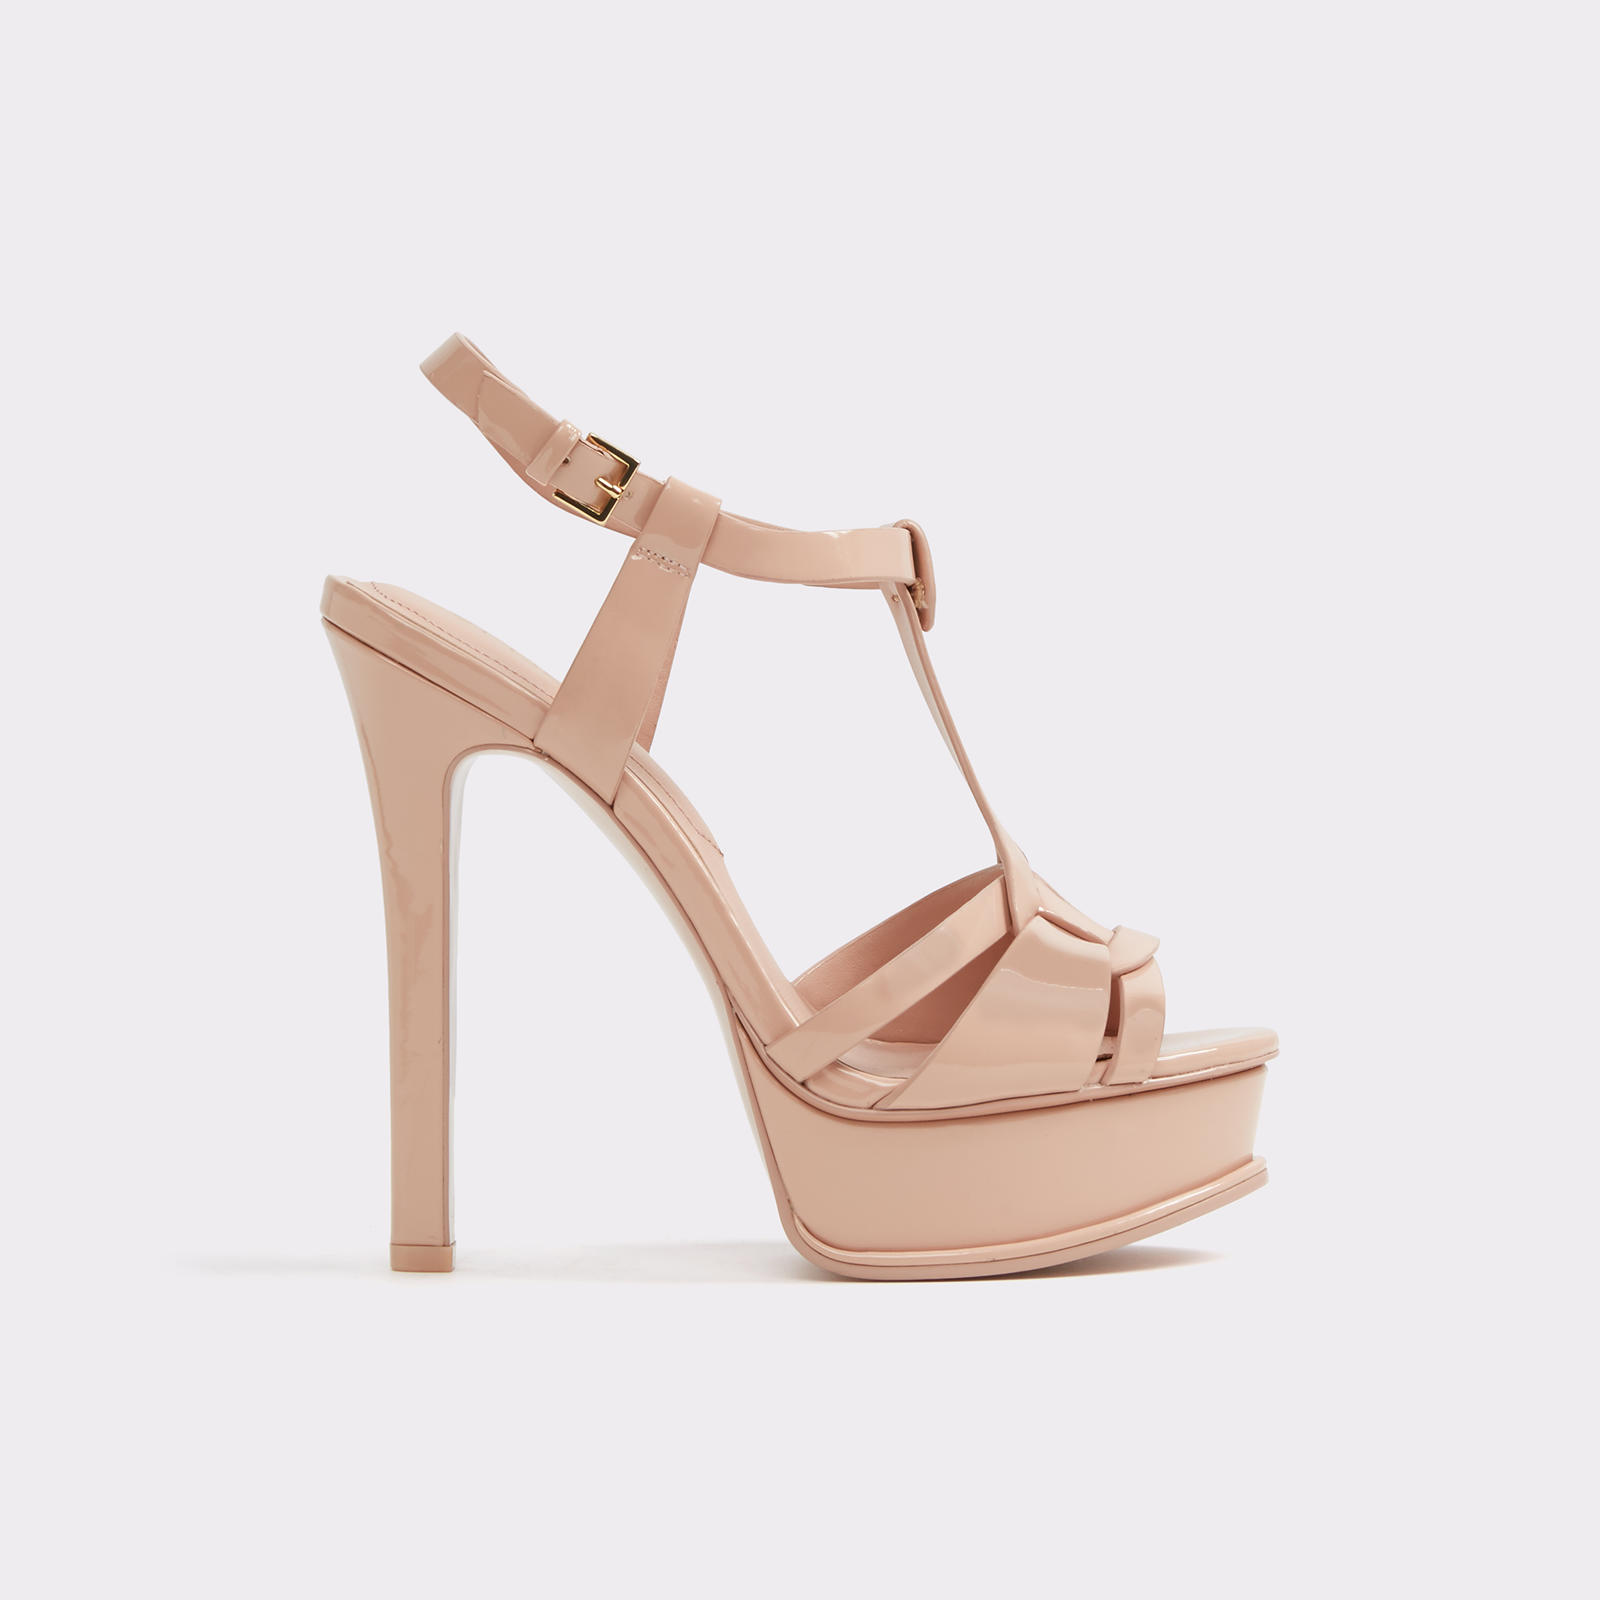 fcbf7ad194d8 Chelly Light Pink Women s Platform sandals